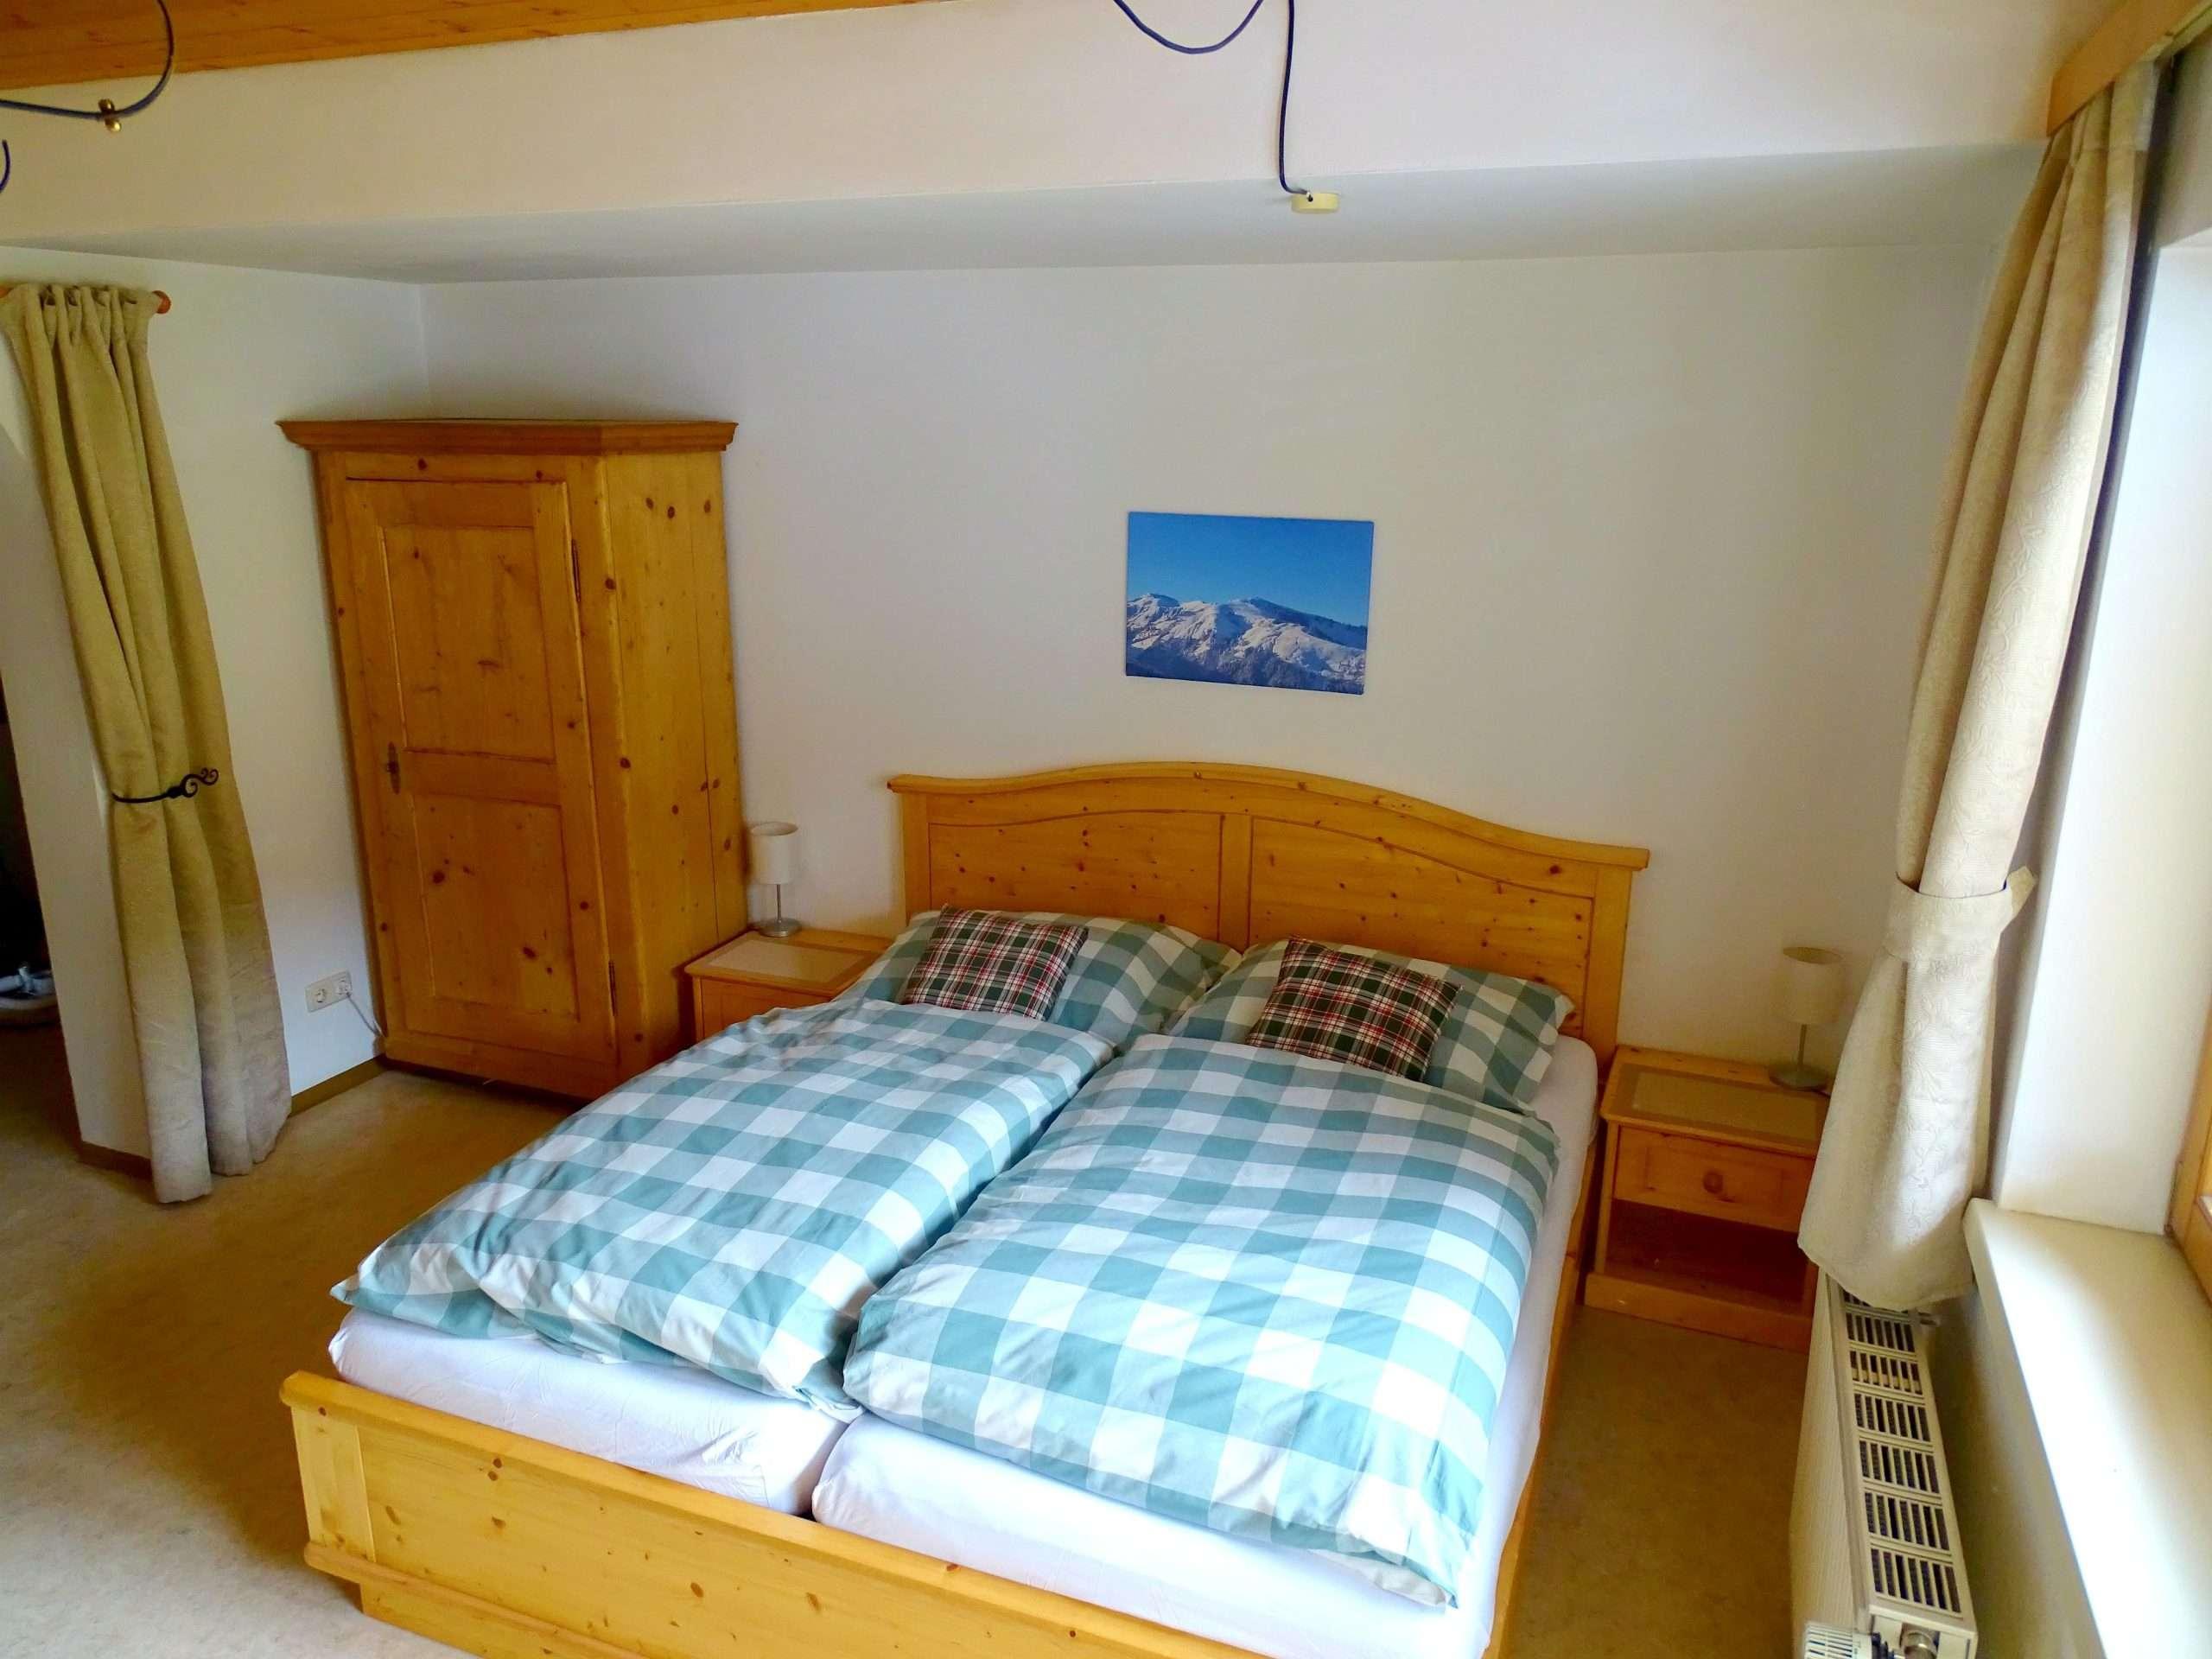 Living area - king bed, Aberg apartment, Haus Schneeberg, Hochkoenig